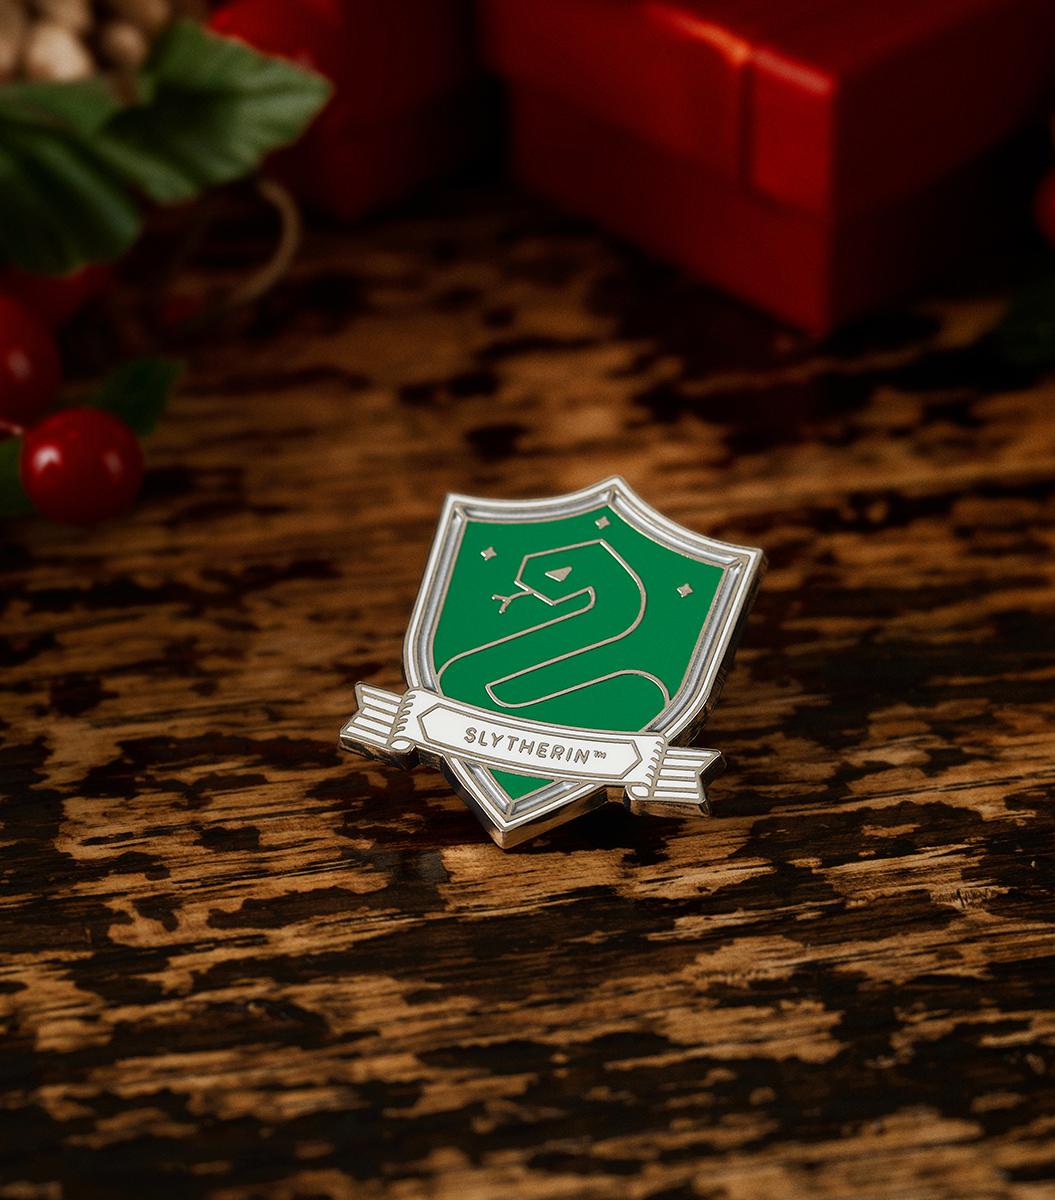 Slytherin™ House Crest Enamel Pin